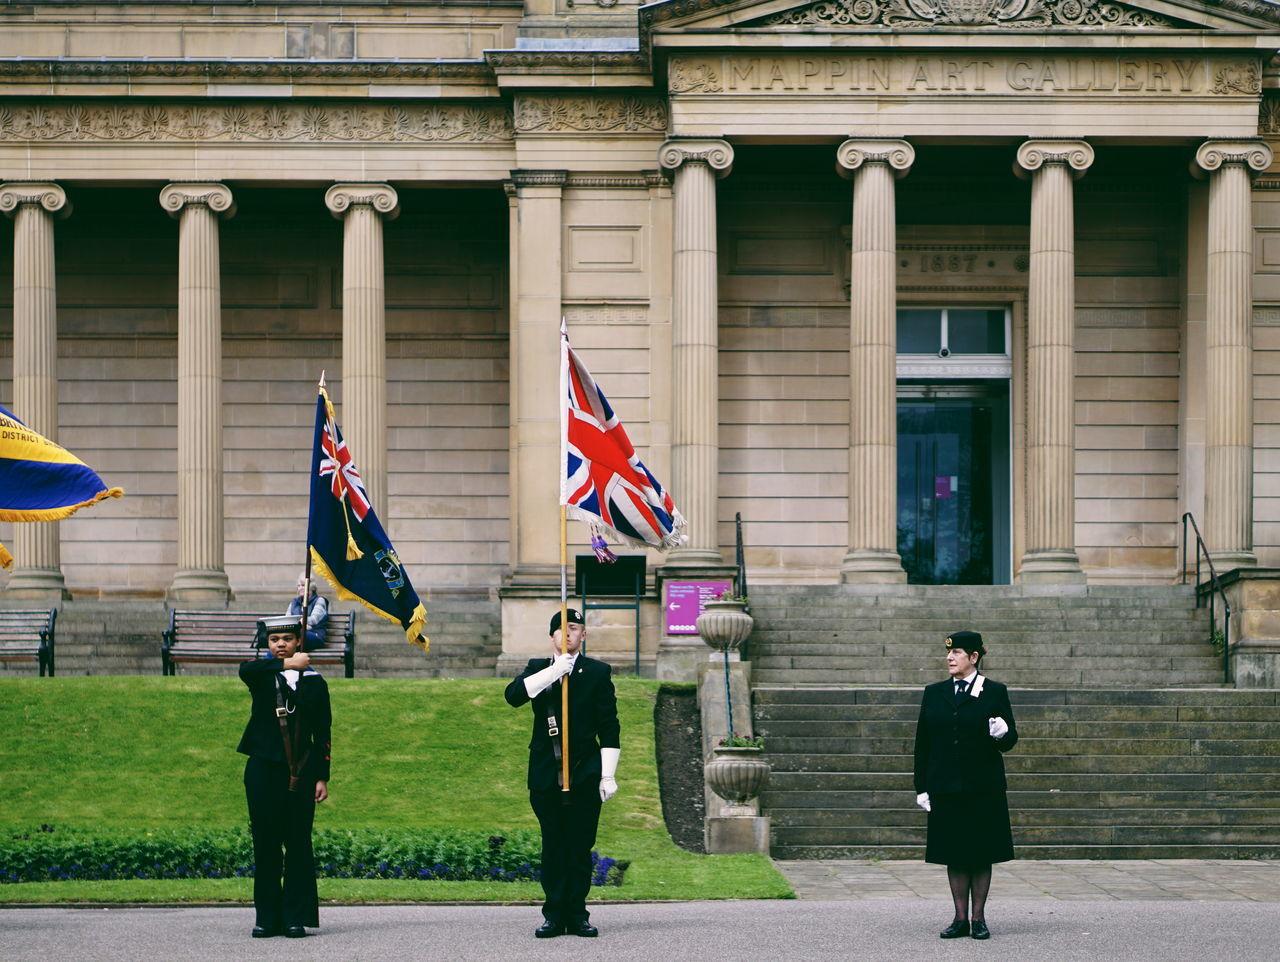 Beautiful stock photos of veteran's day, flag, patriotism, senior women, city